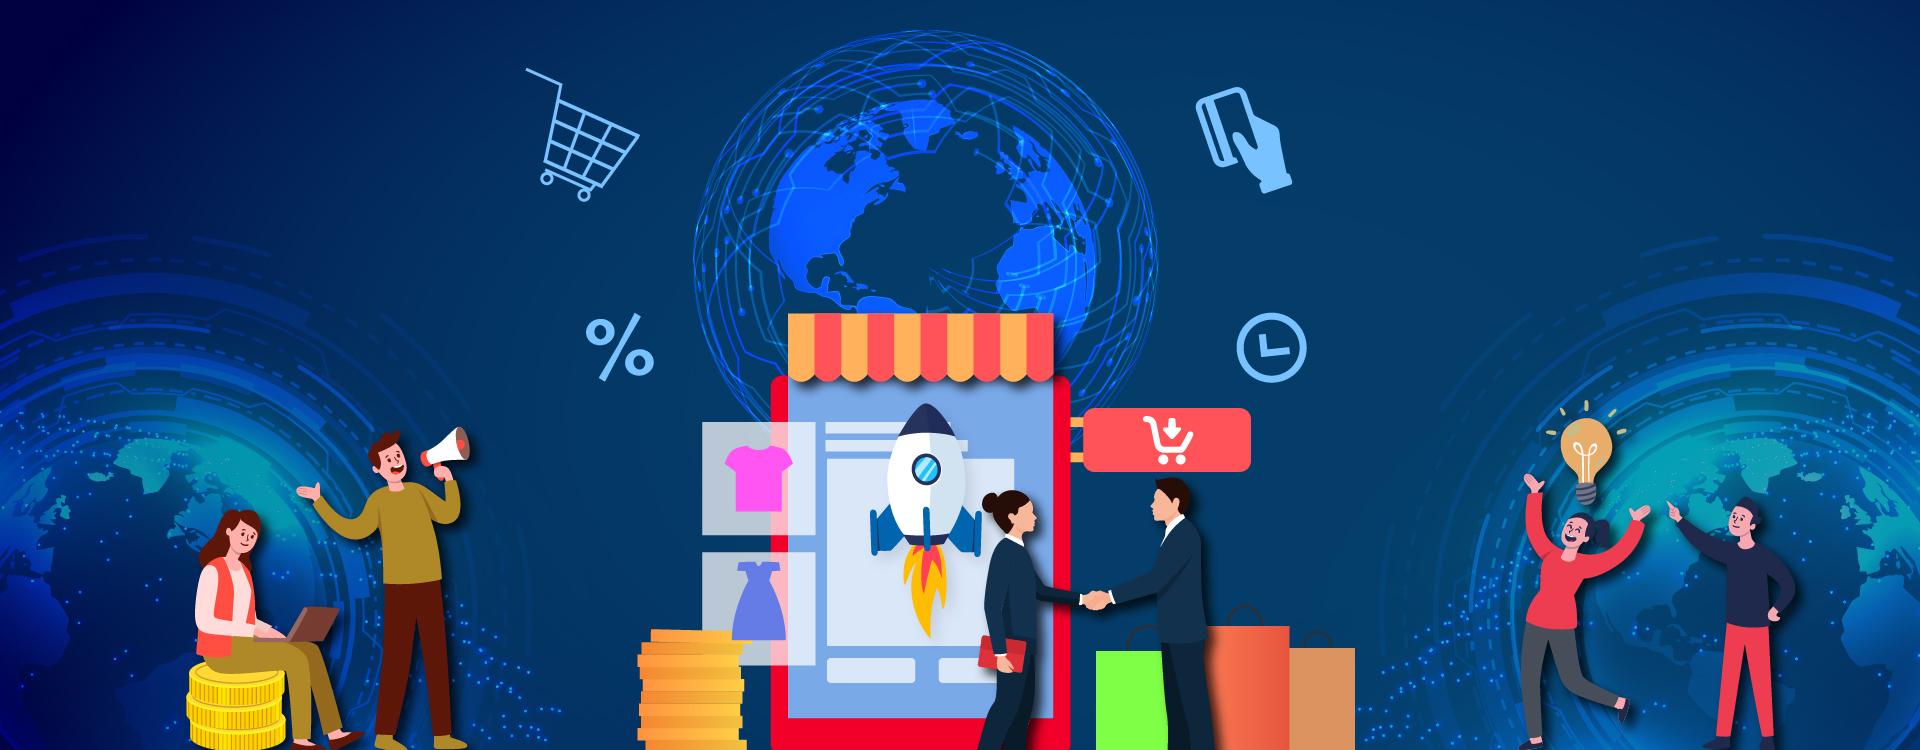 Retail Start-Ups: Top International Investors Looking to Partner-up